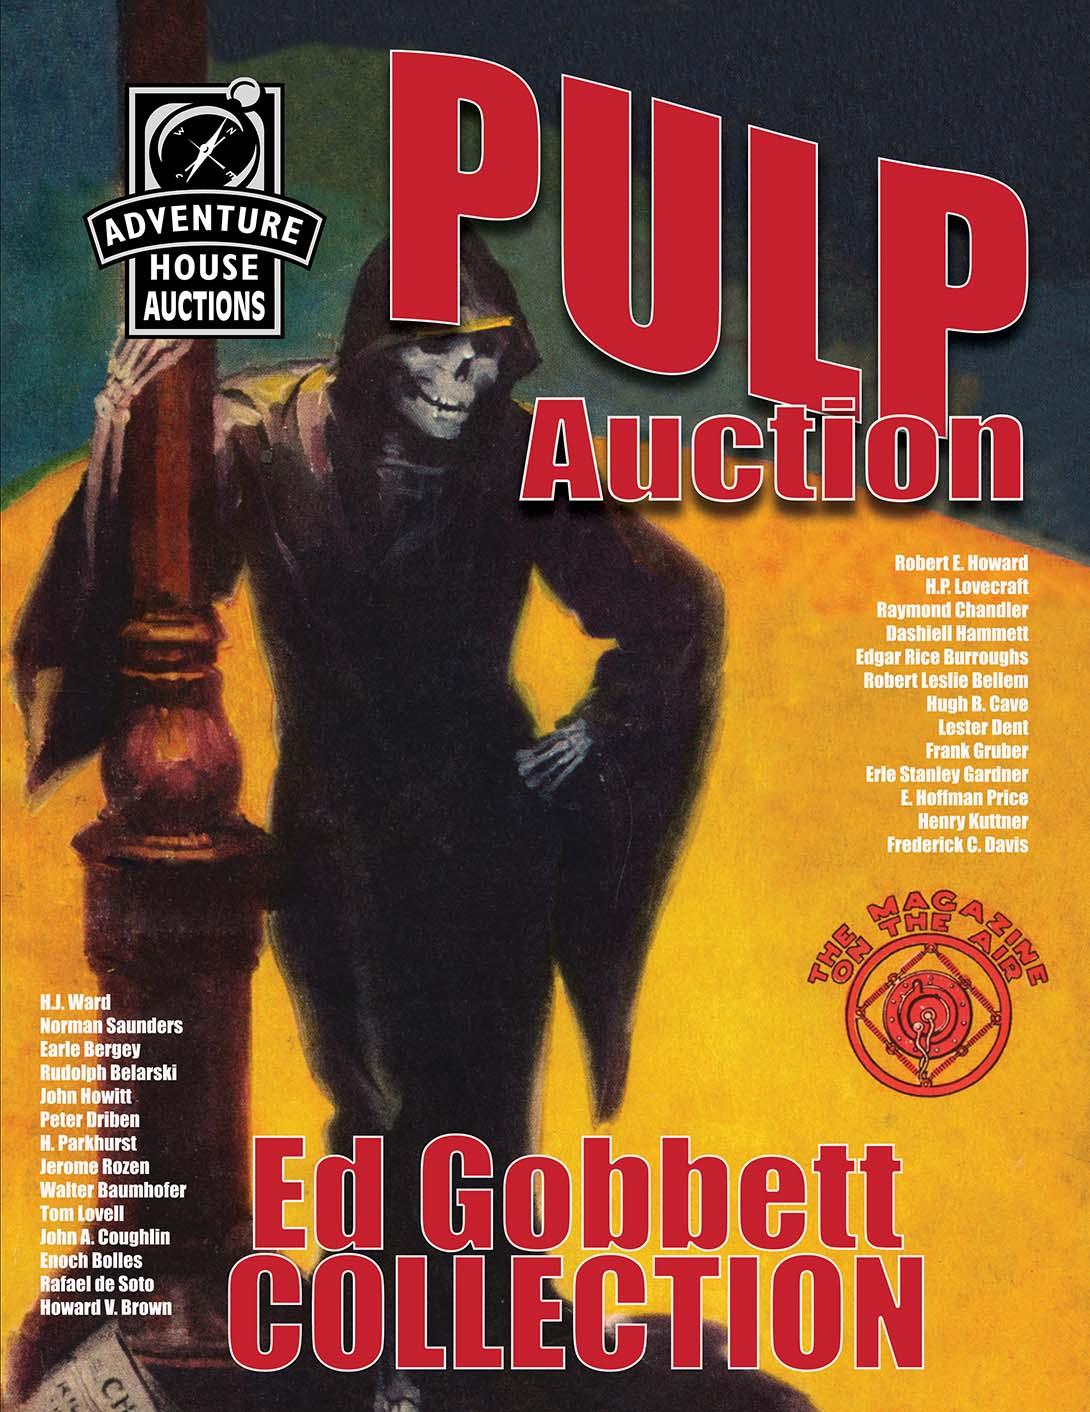 Ed Gobbett Auction Catalog - 130 Page Full Color ...